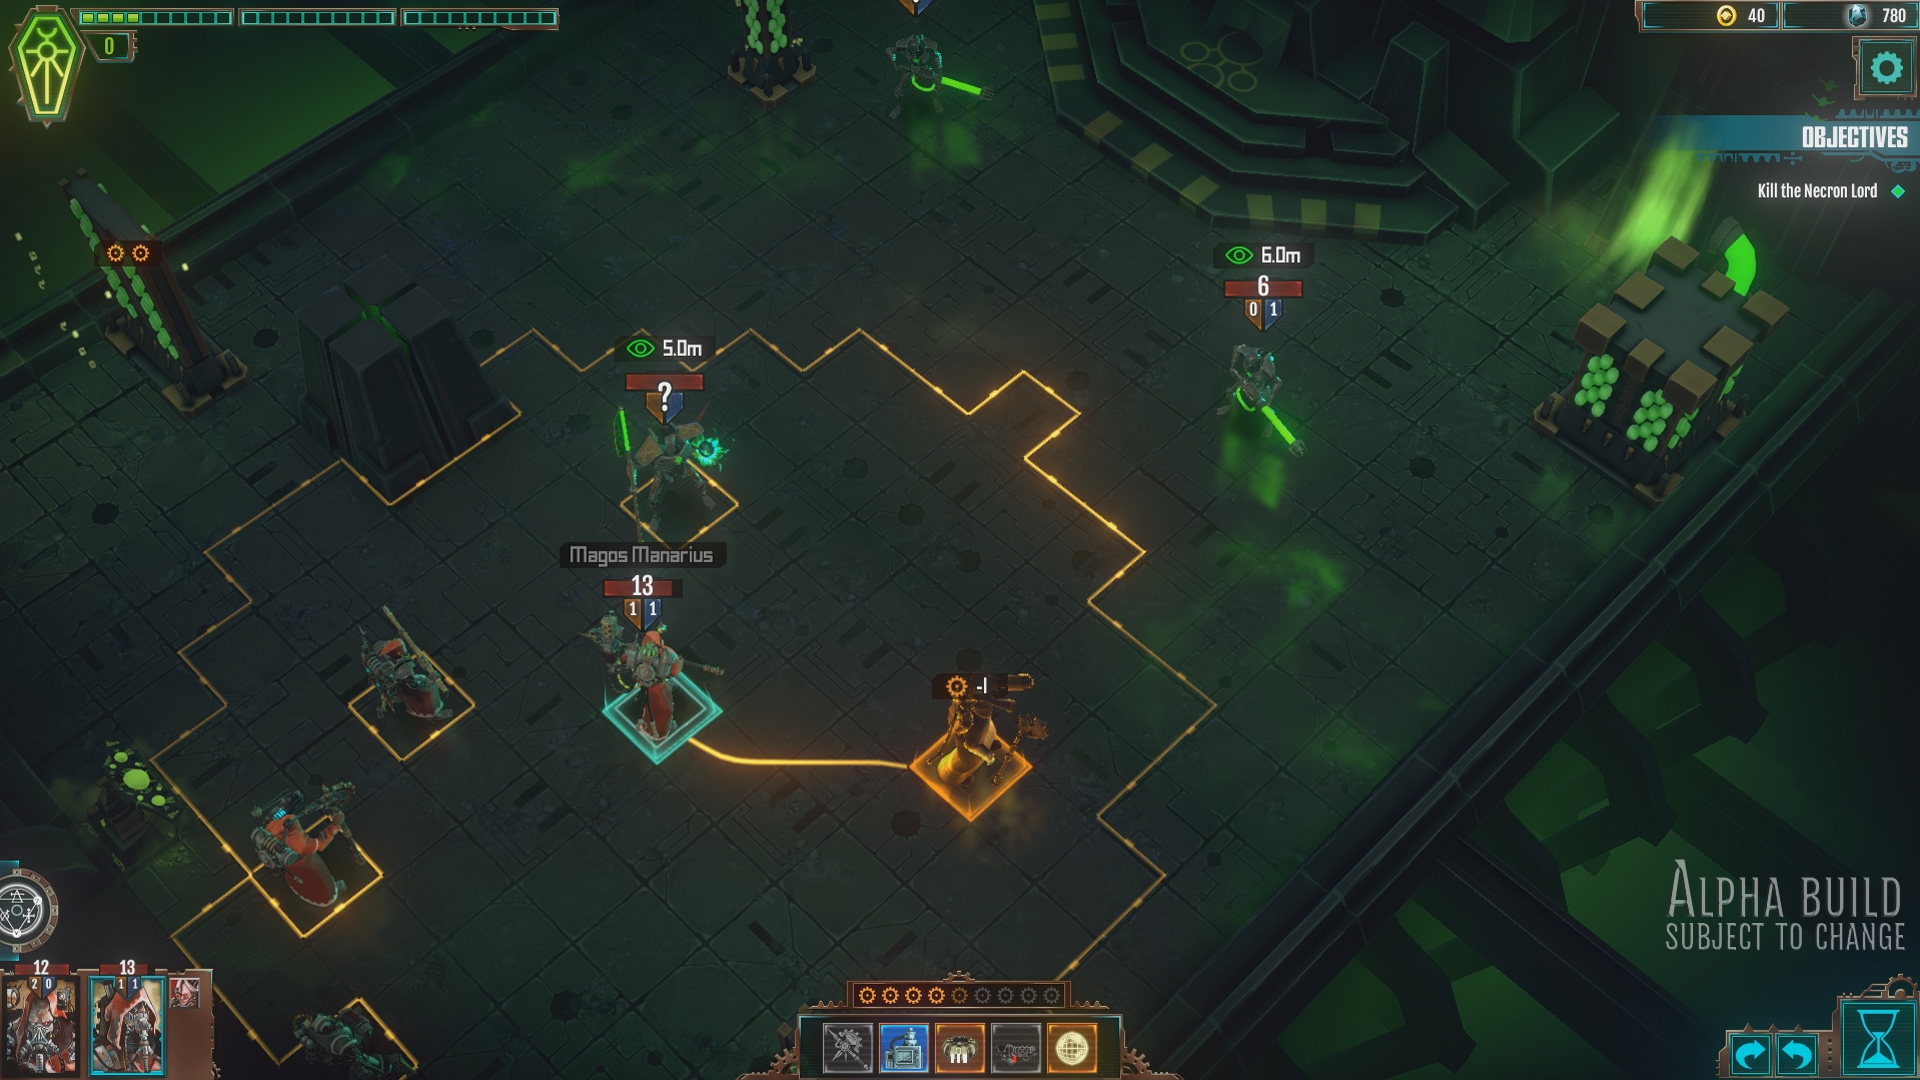 Warhammer 40,000: Mechanicus Review - Gaming Respawn